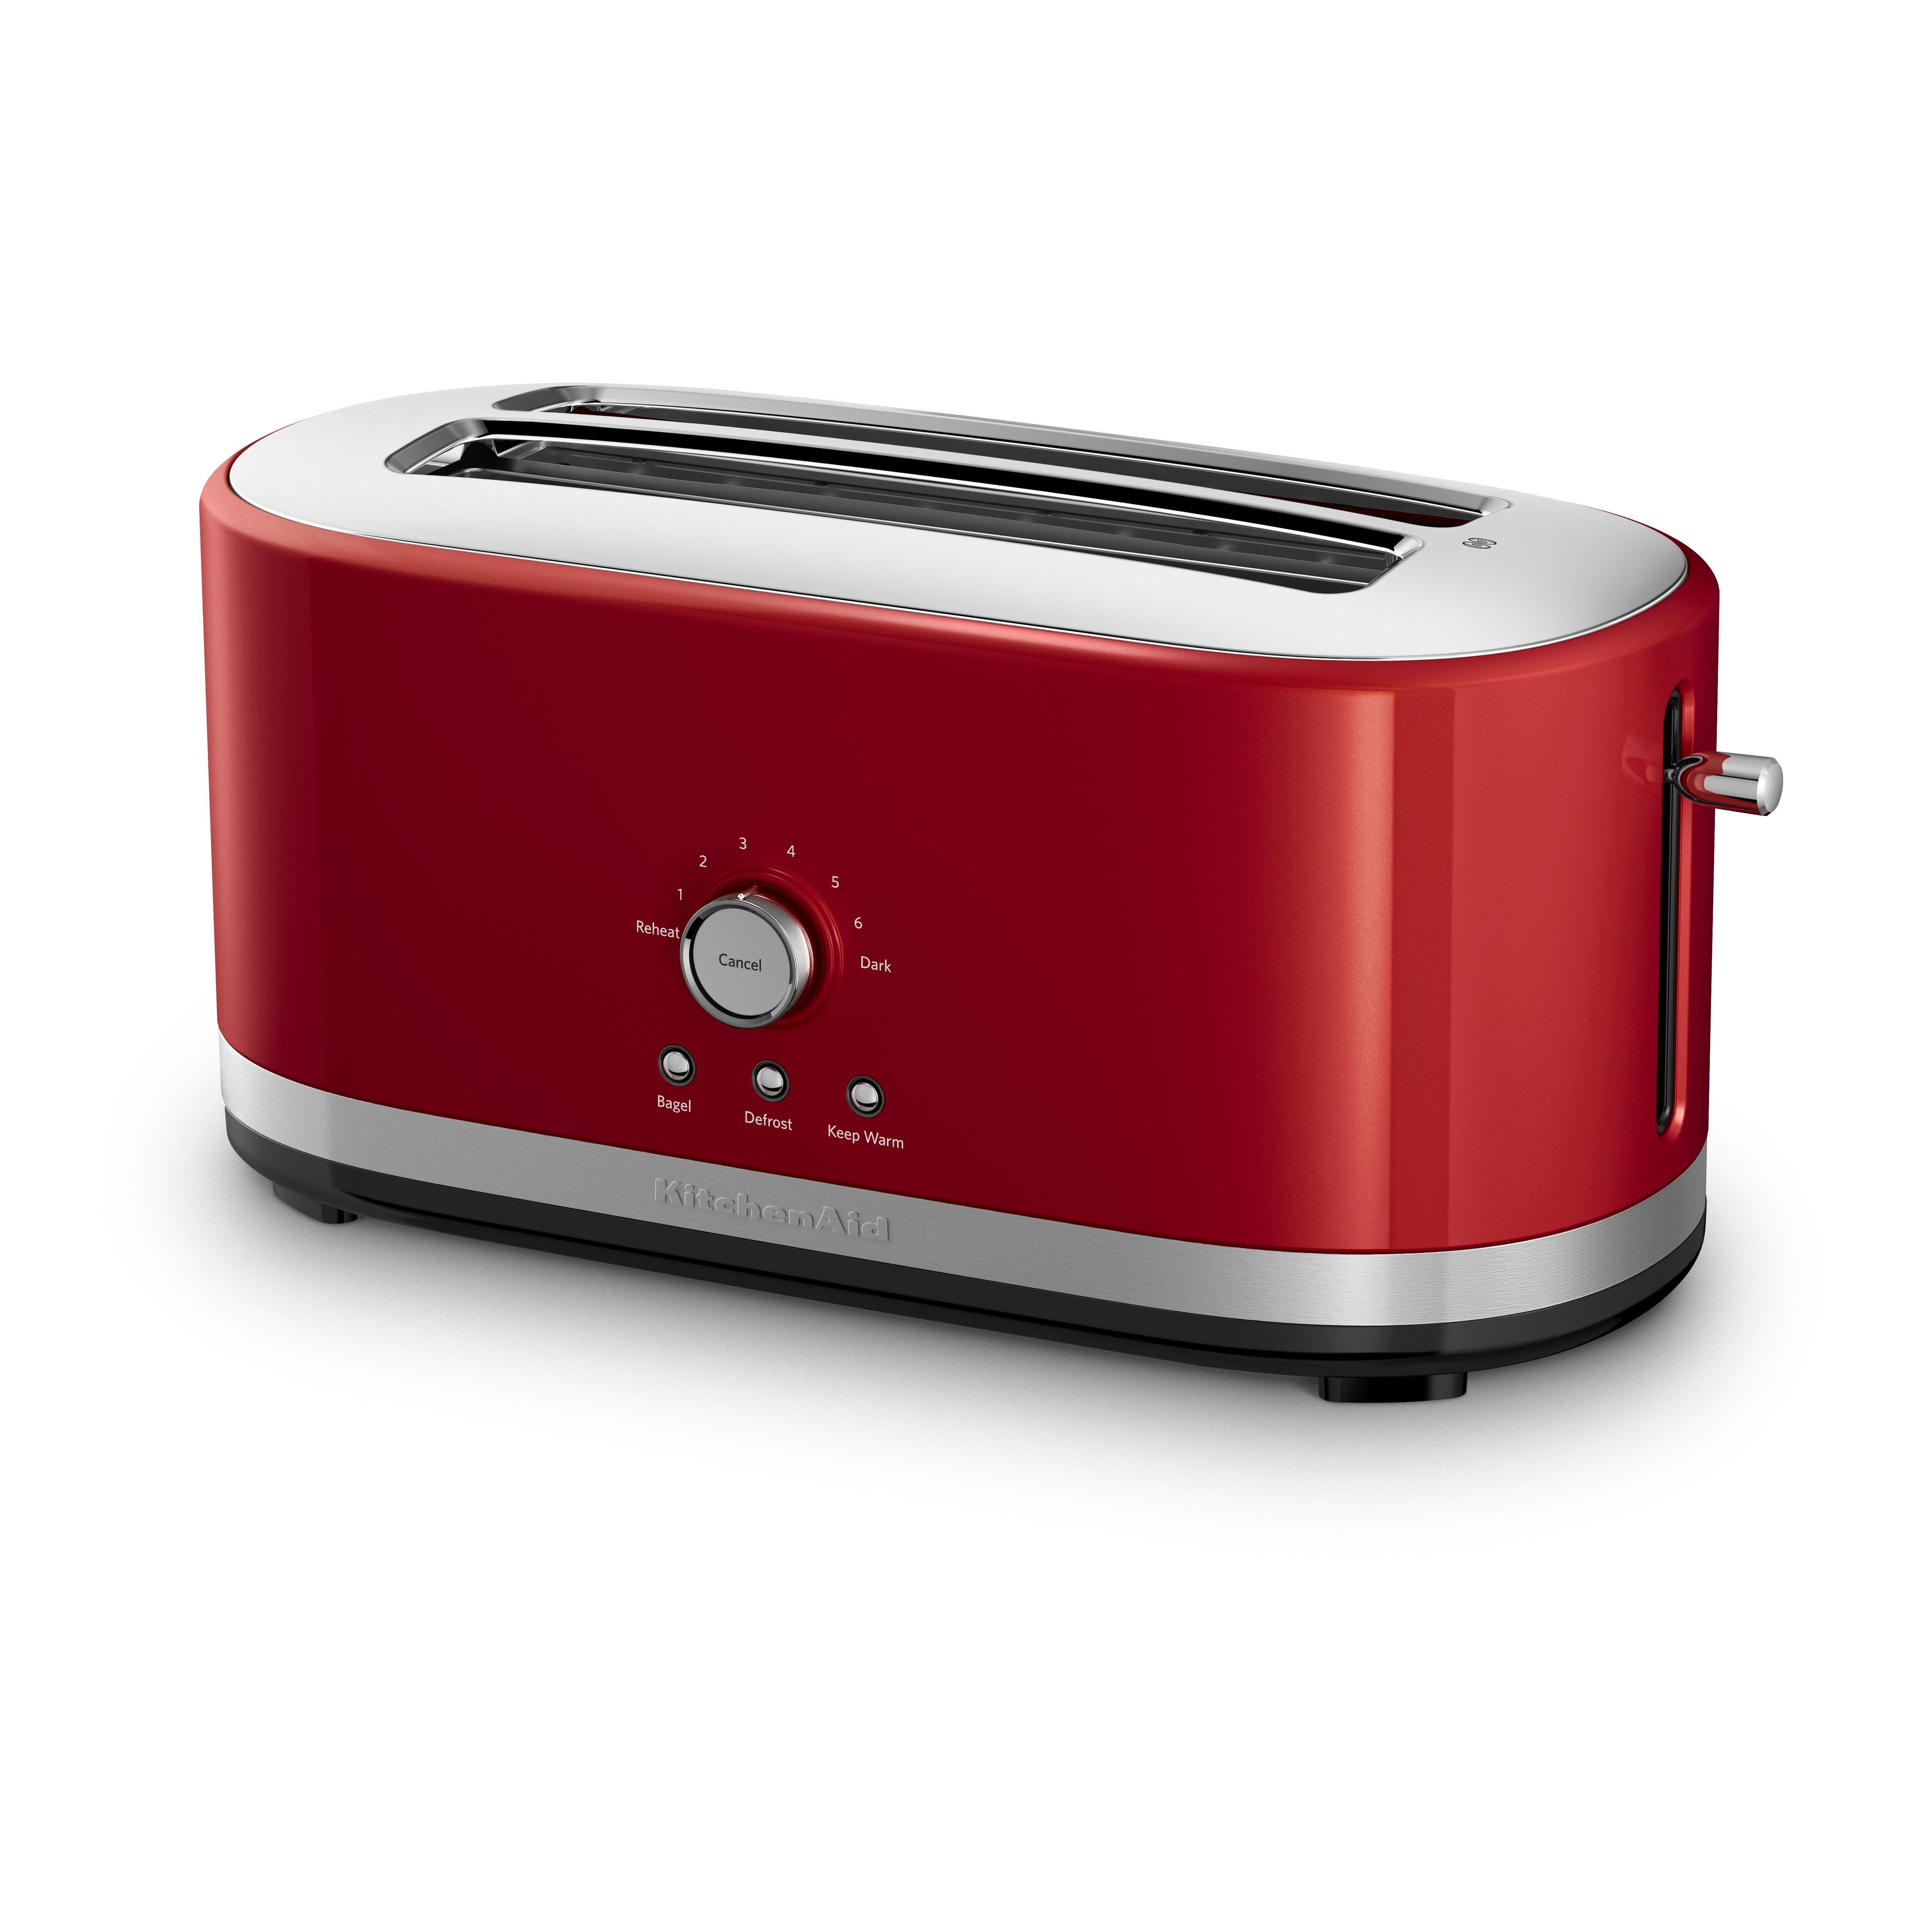 slice long content smart cast wverrors wp slot toaster breville die